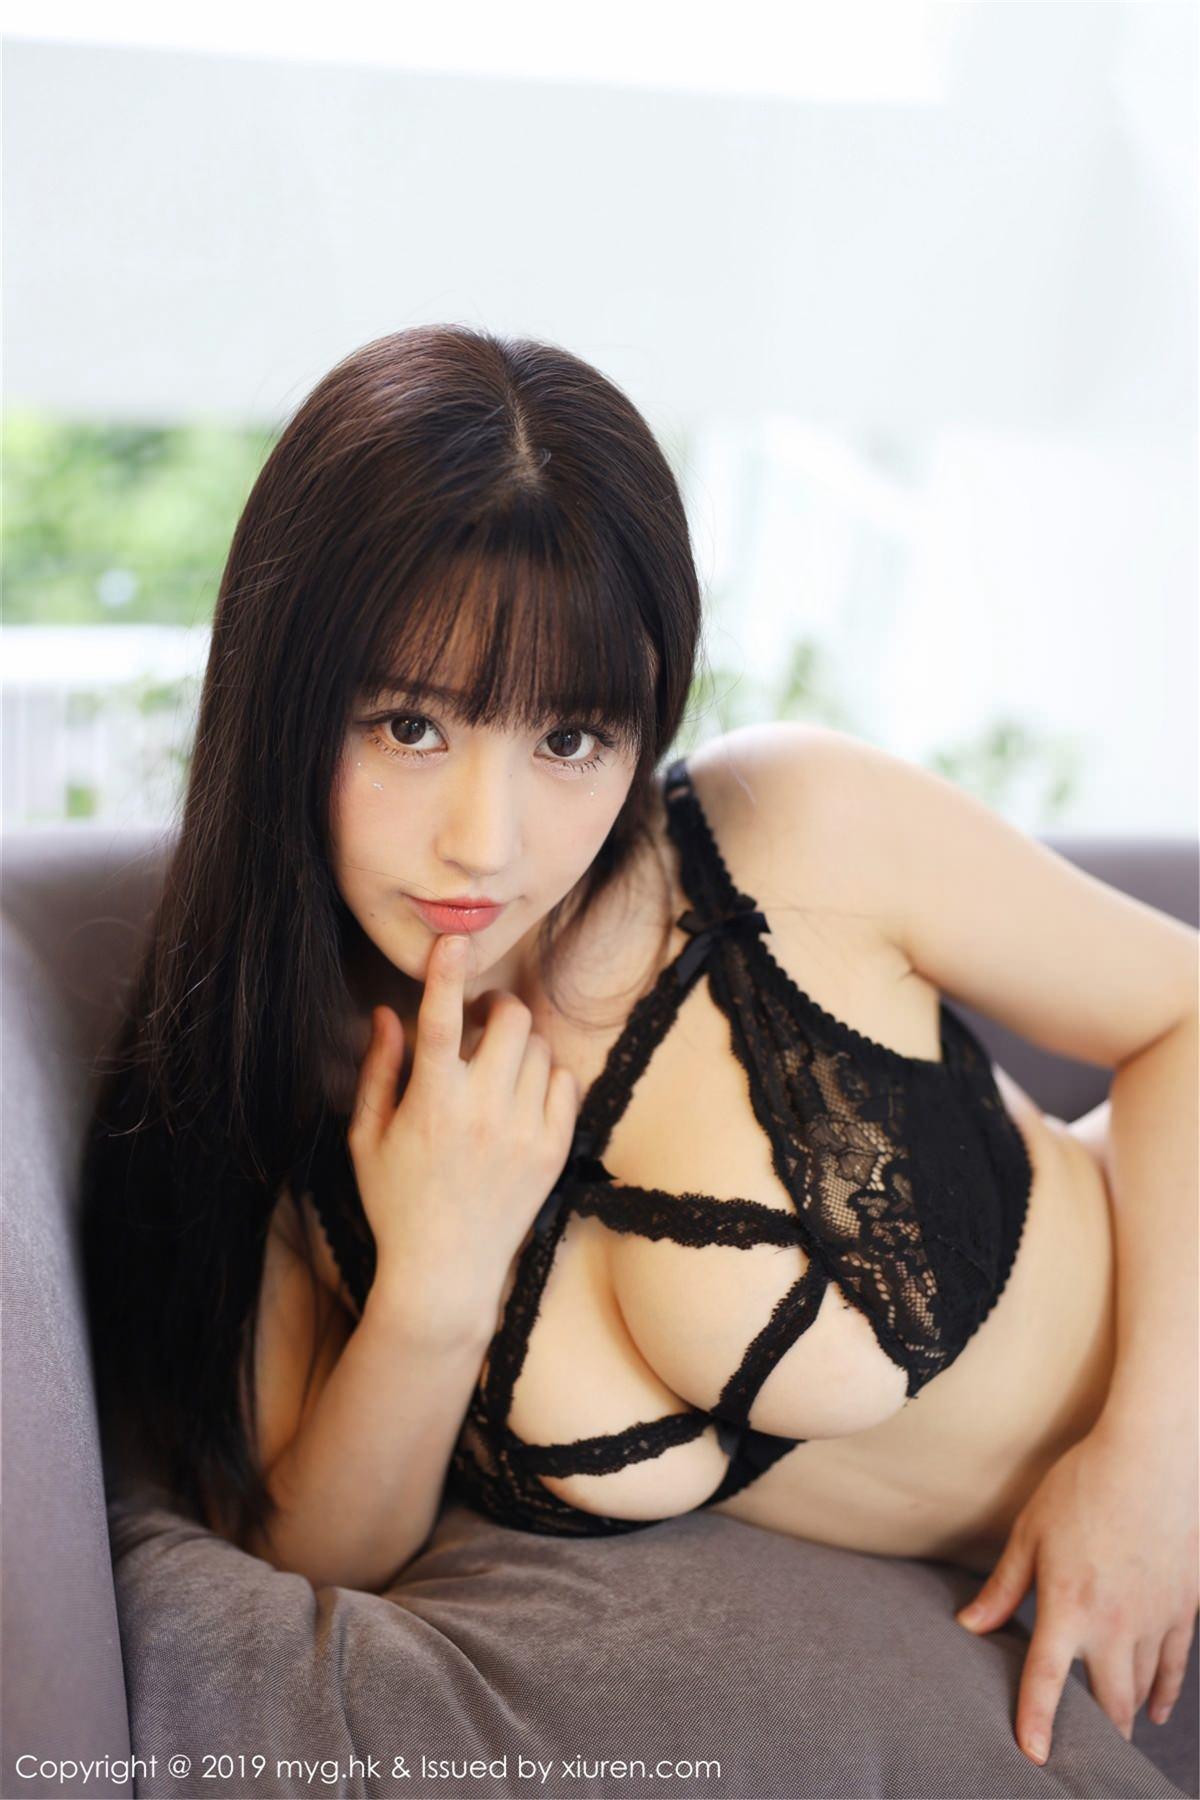 MyGirl Vol.357 74P, mygirl, Zhu Ke Er